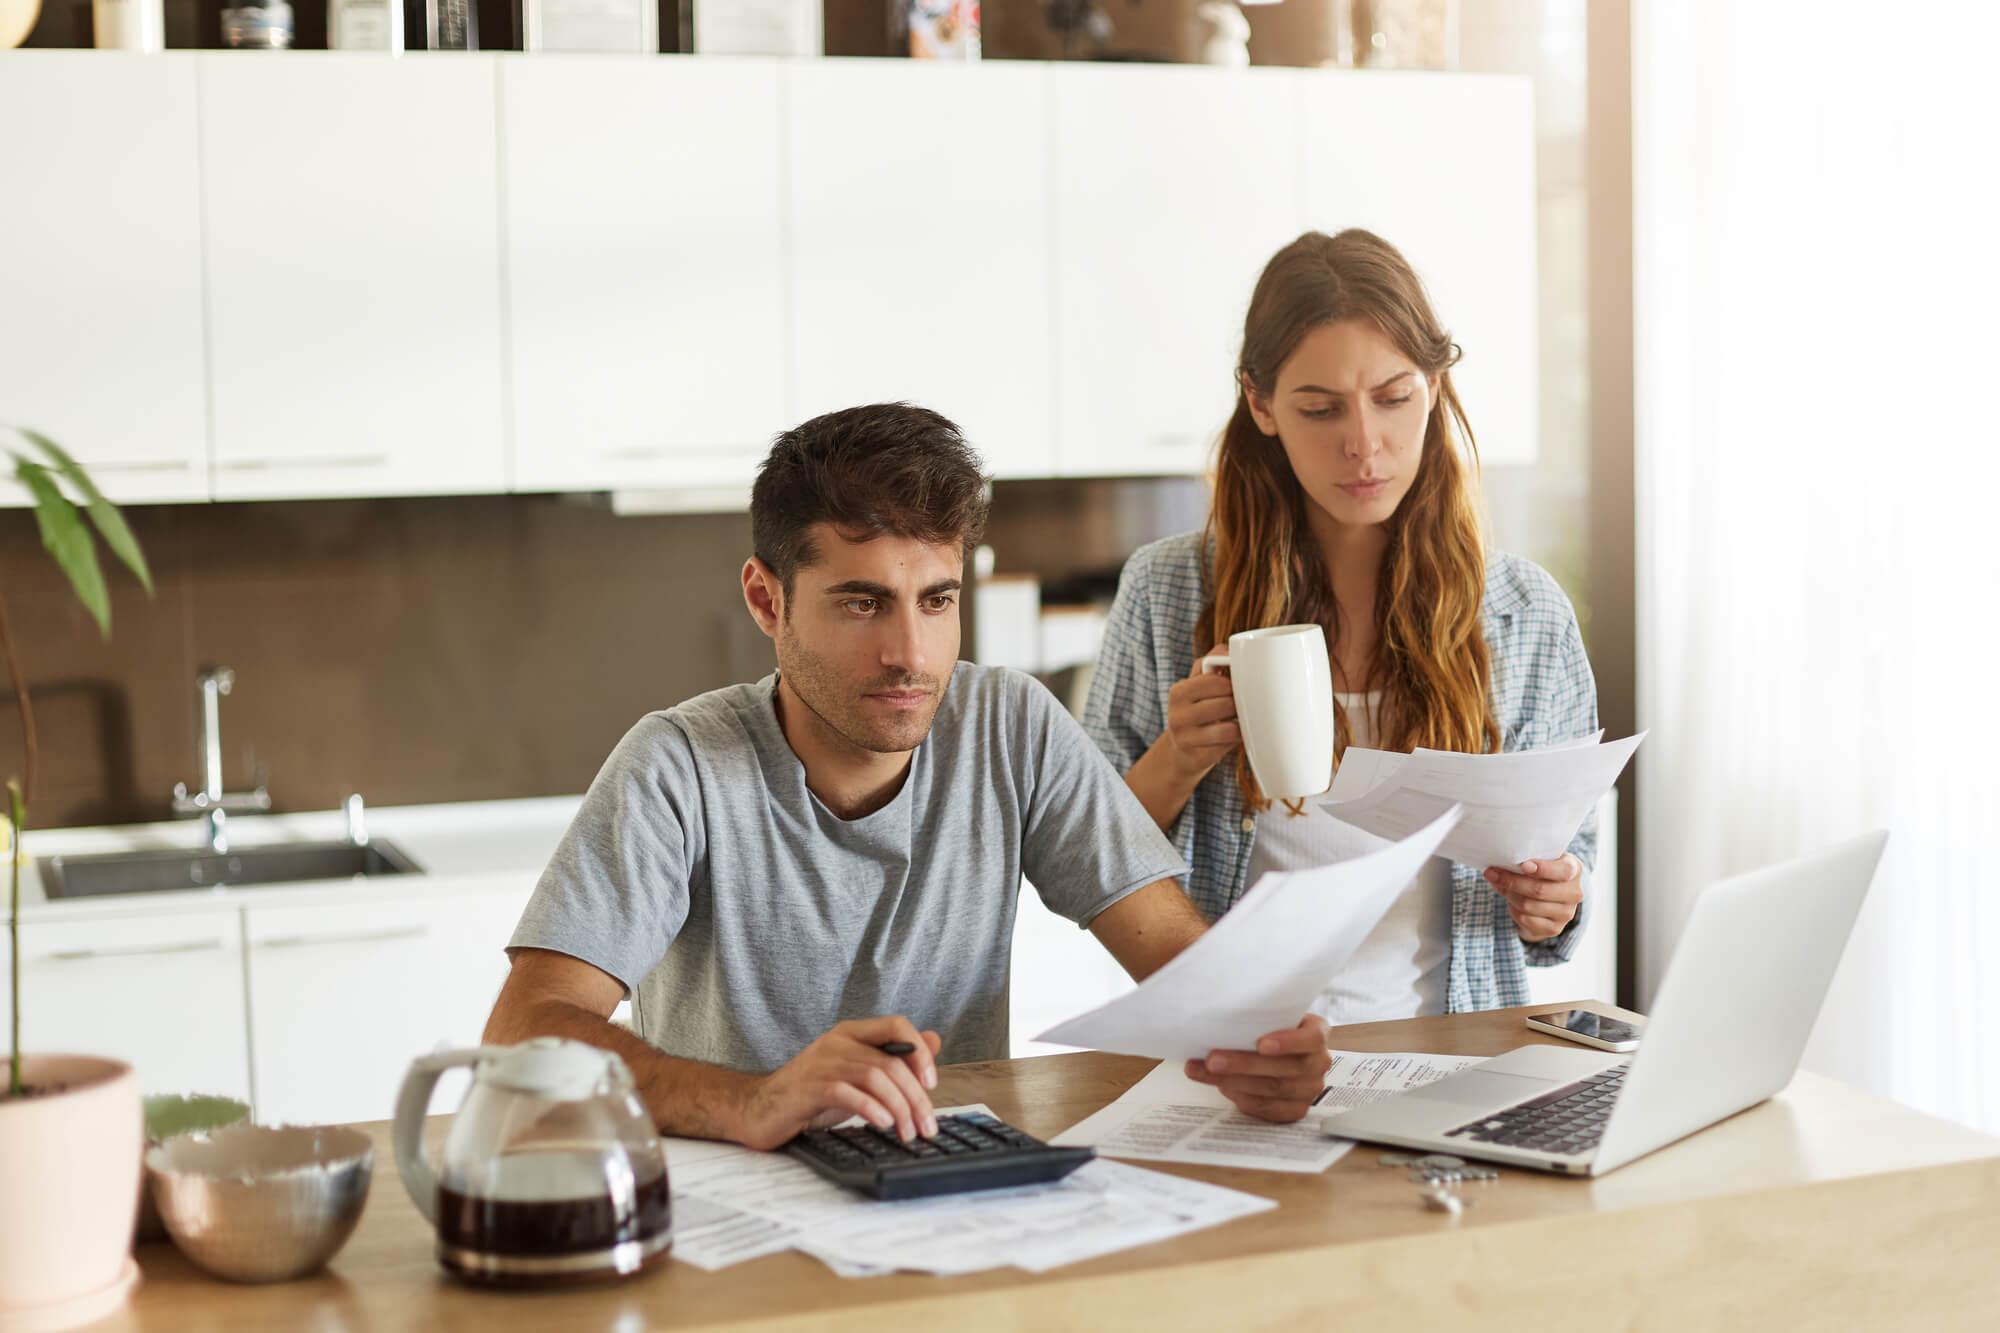 7 vantagens do modelo de pagamento recorrente para o consumidor